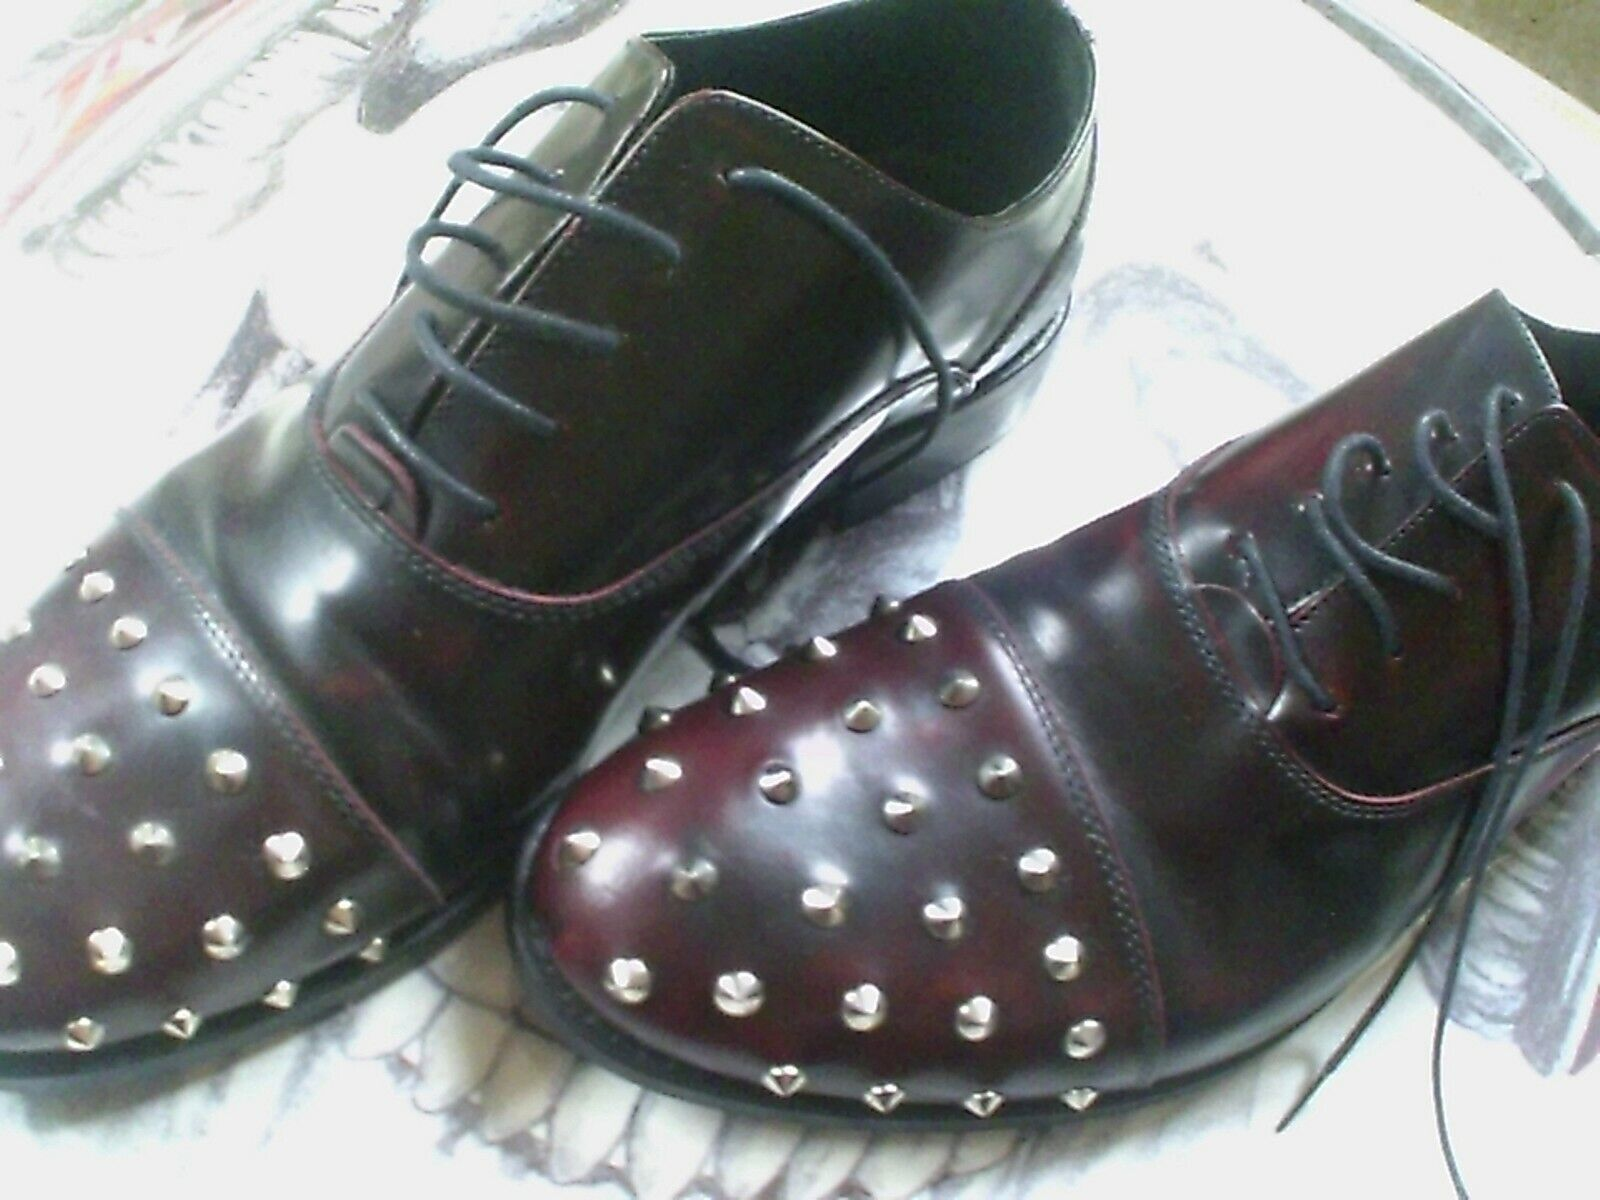 Sconto del 40% KURT GEIGER  oxblood STUD scarpe LEATHER Lace-up STYLE,MODS,PUNK STYLE,MODS,PUNK STYLE,MODS,PUNK ELECTRO  fornire un prodotto di qualità